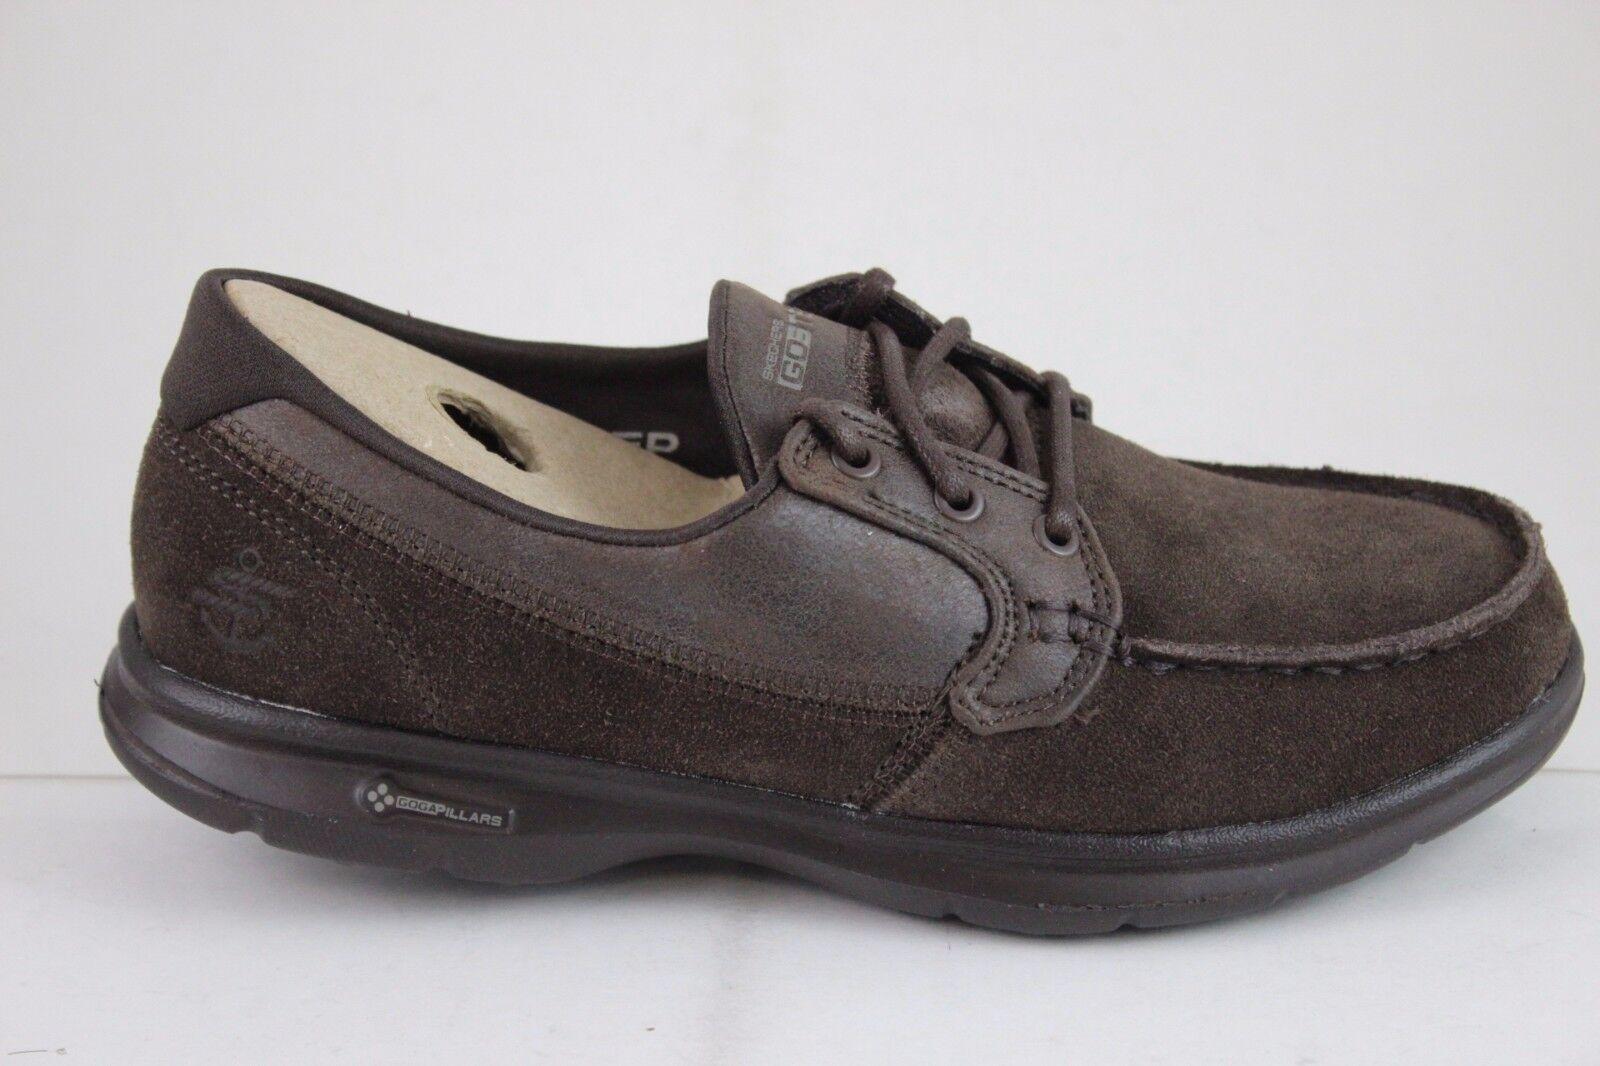 Skechers Mujer Go Step-Stylish 14445 Chocolate Goga Max Plantilla Nuevo